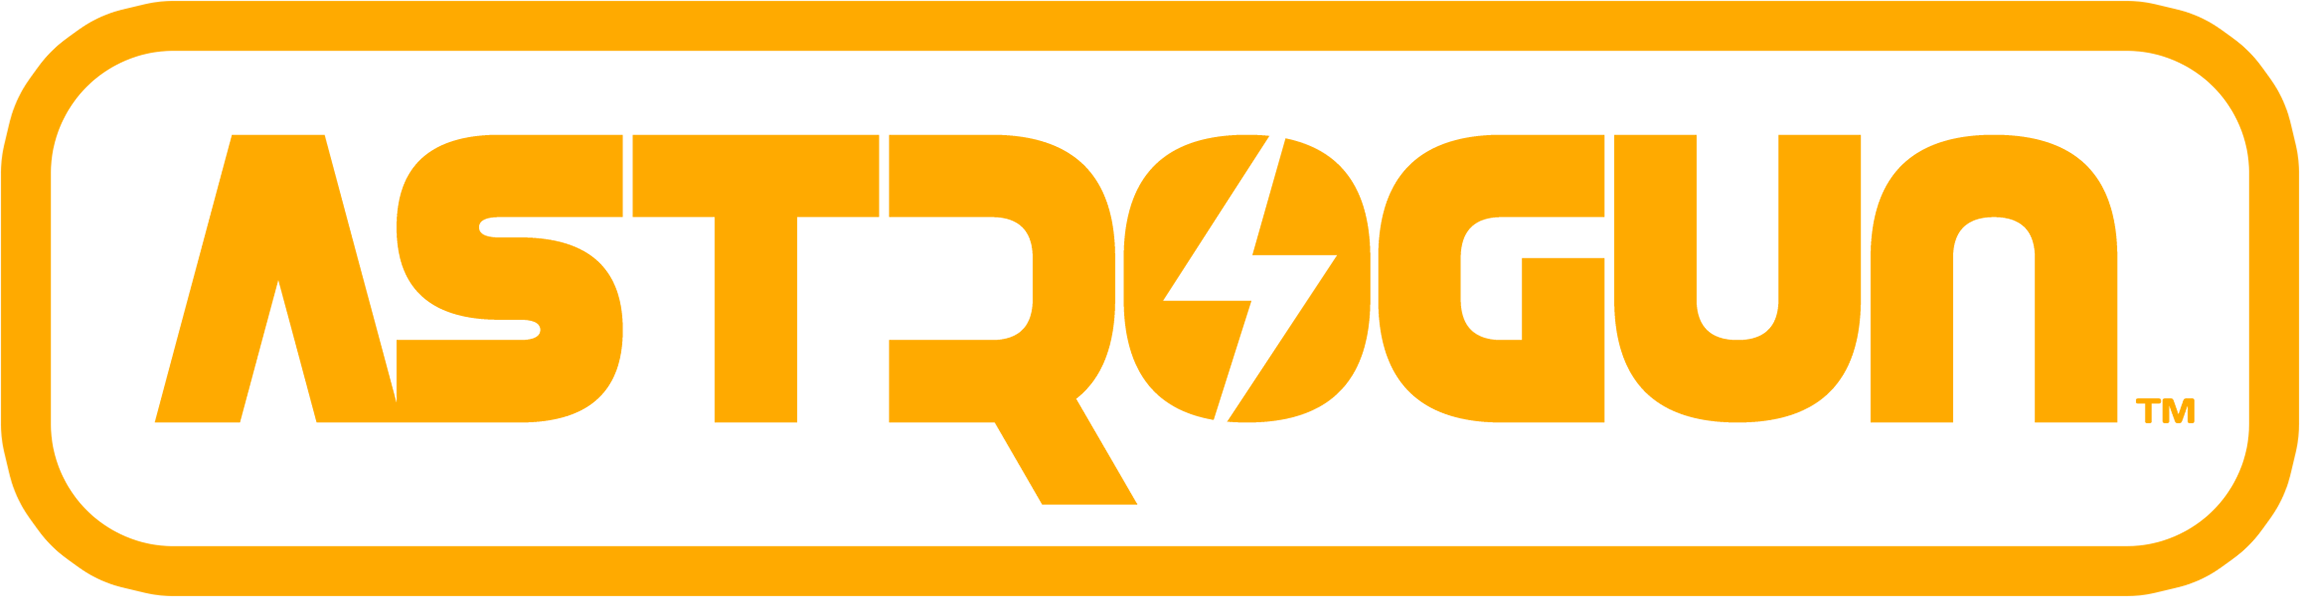 ASTROGUN - Logo - Sherbet